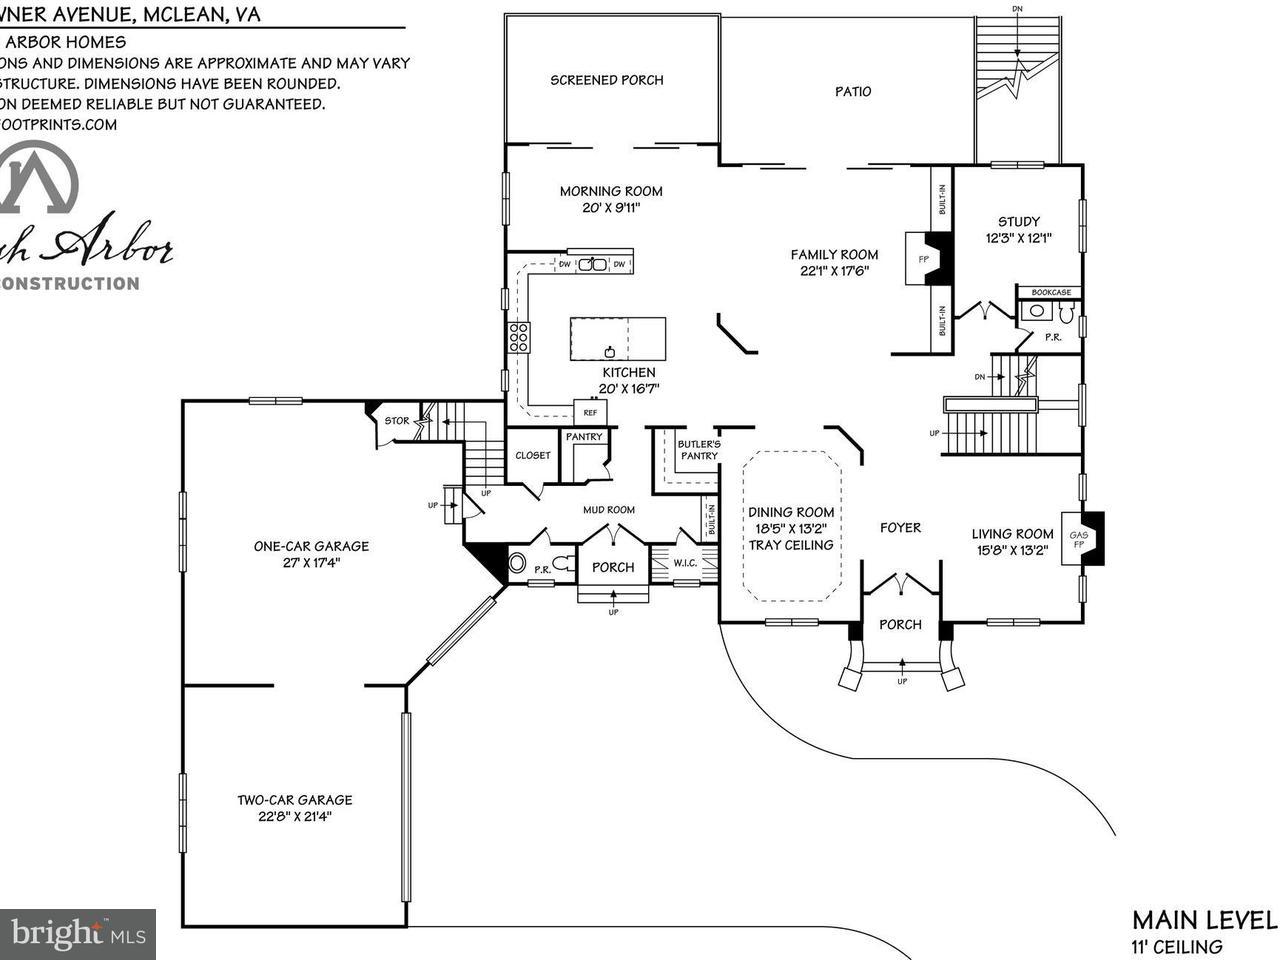 Single Family Home for Sale at 6602 Brawner Street 6602 Brawner Street McLean, Virginia 22101 United States